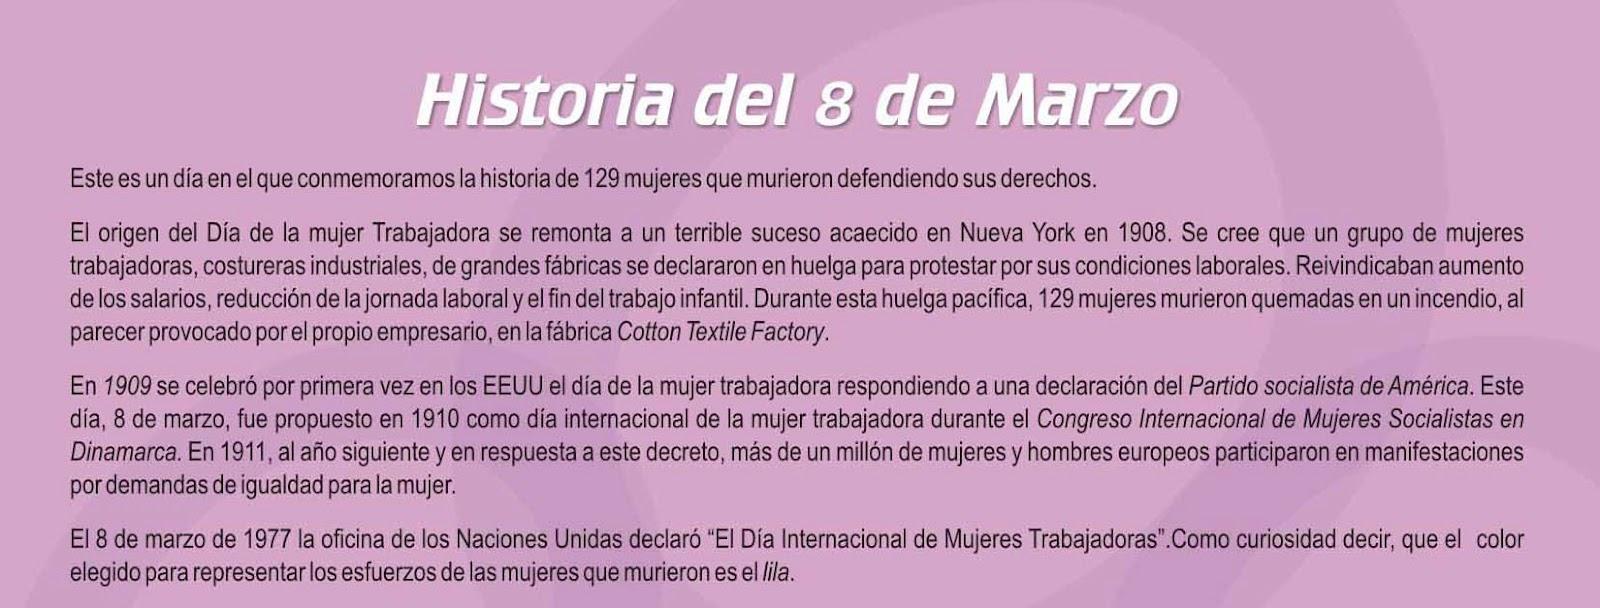 HISTORIA 8 MARZO DIA INTERNACIONAL MUJER